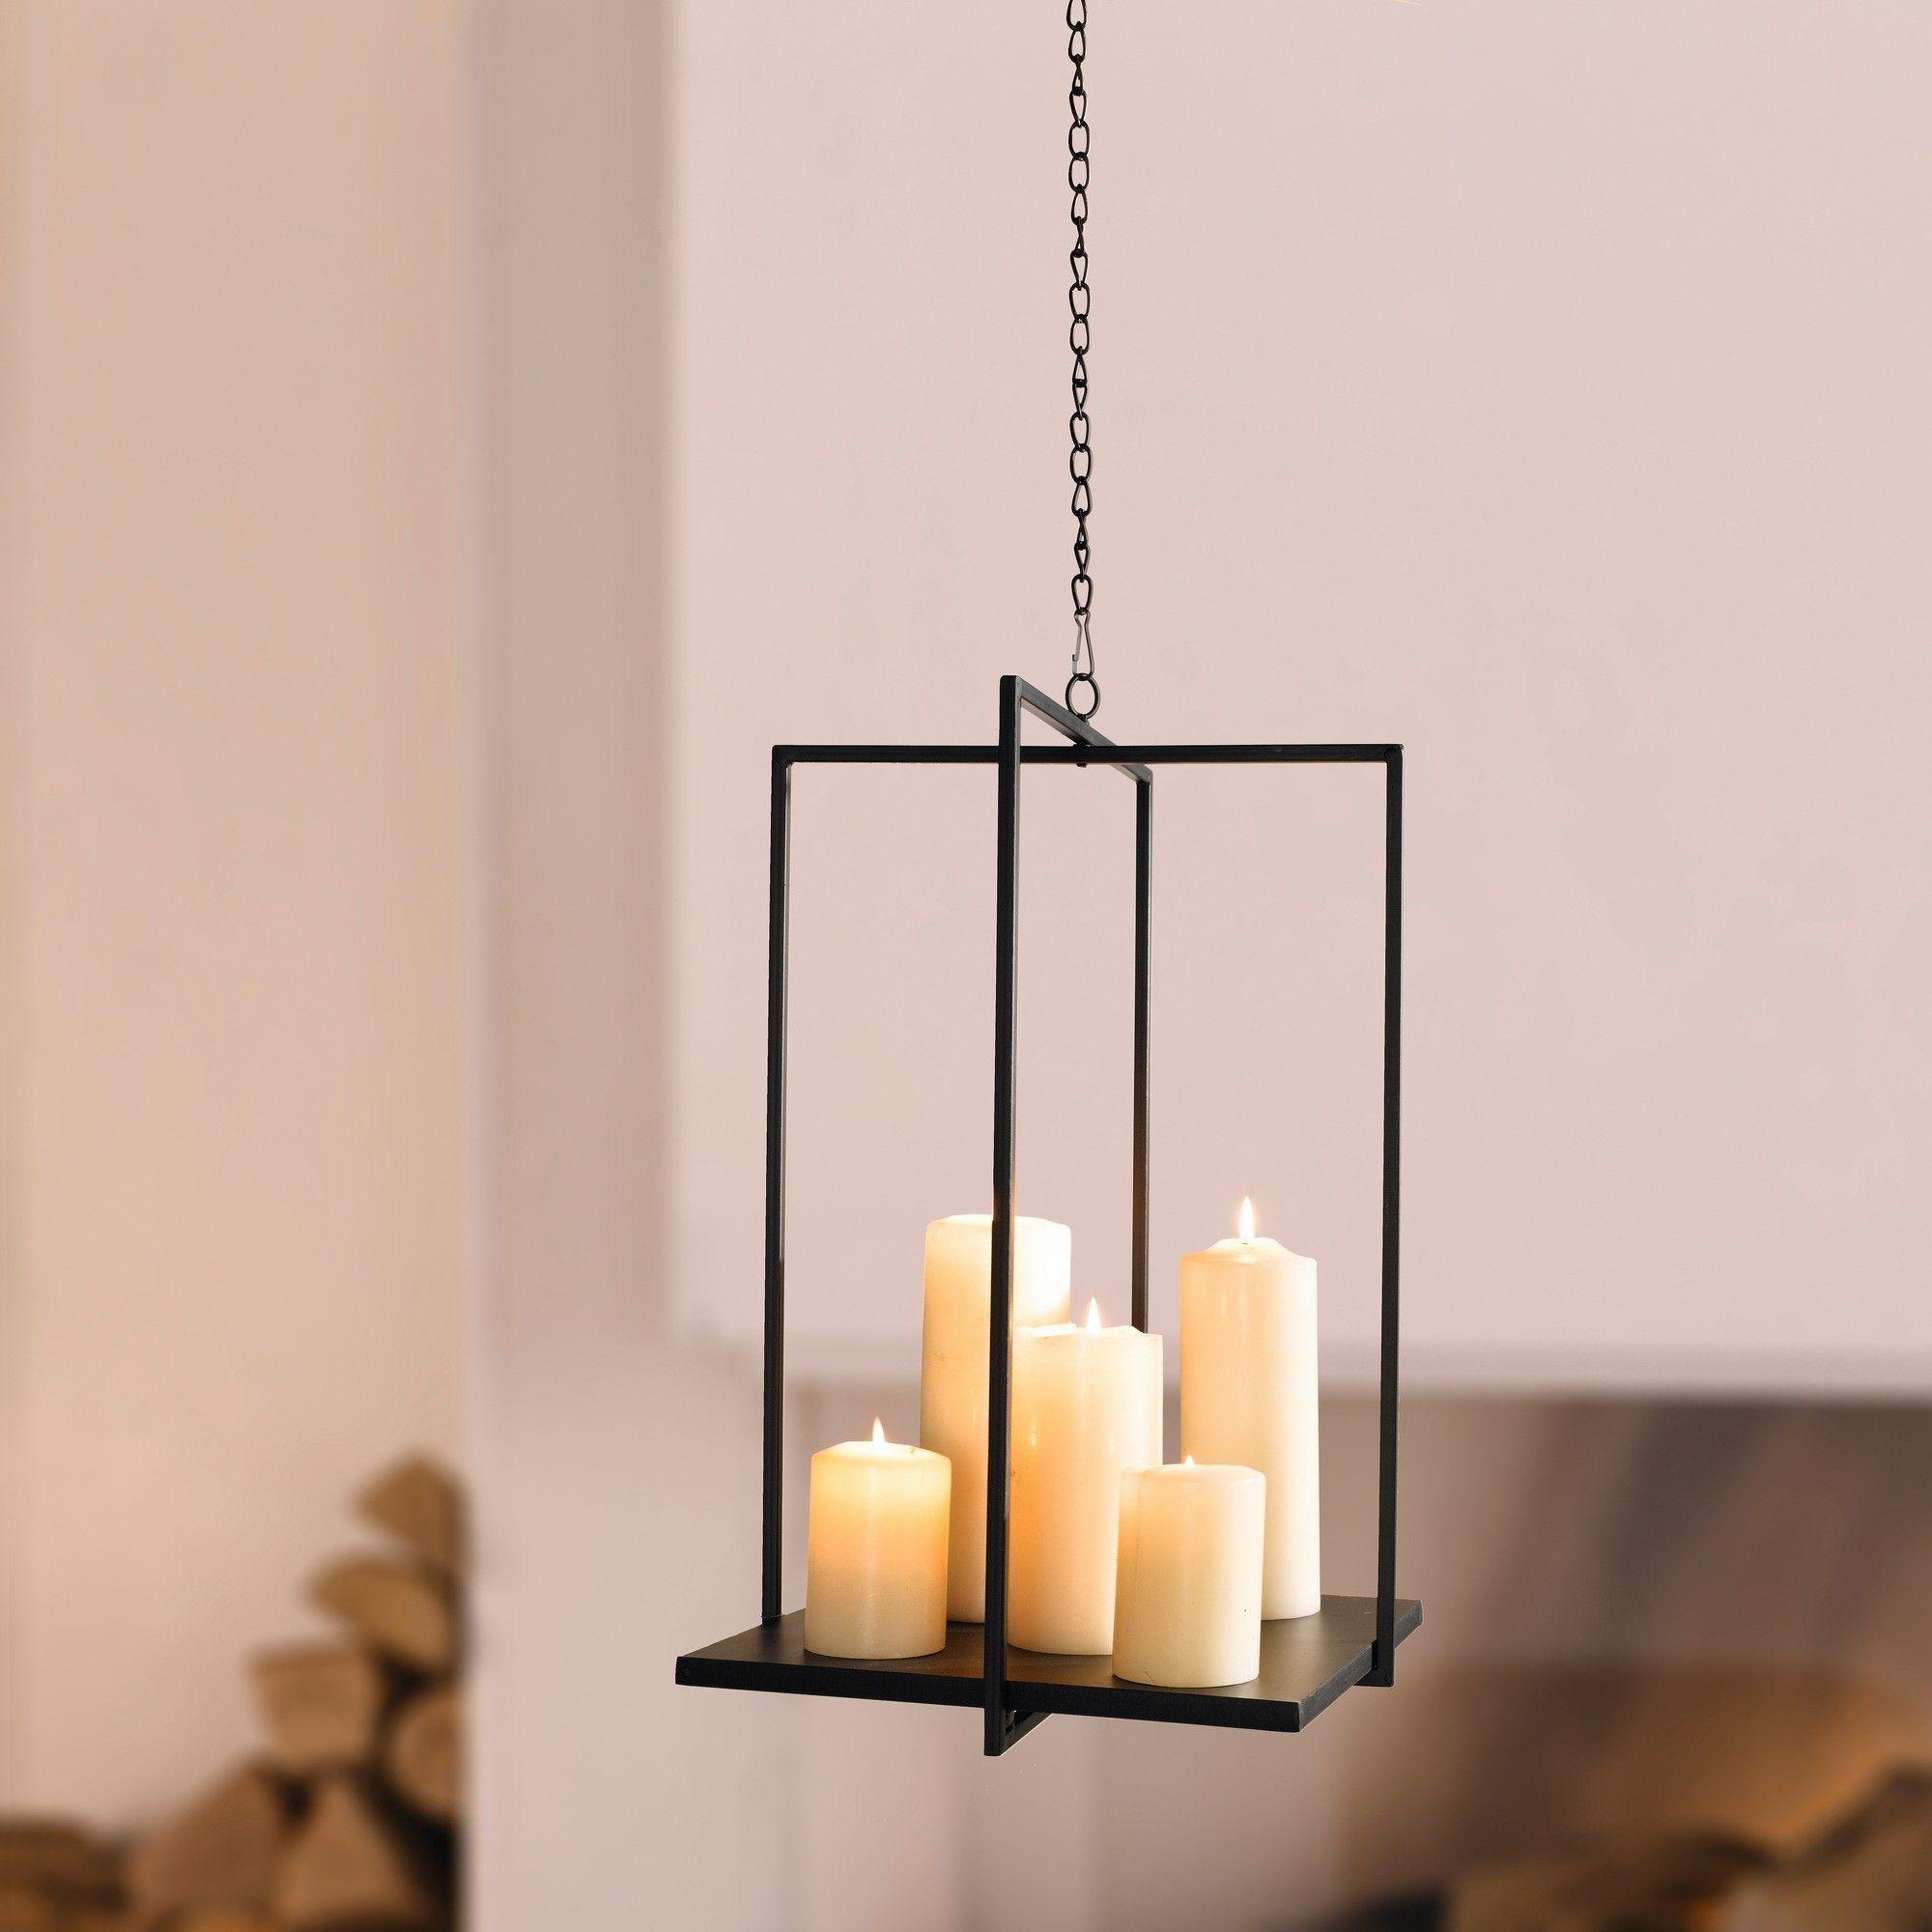 Metall h nger deko tablett kerzenlicht llampen for Metall deko shop